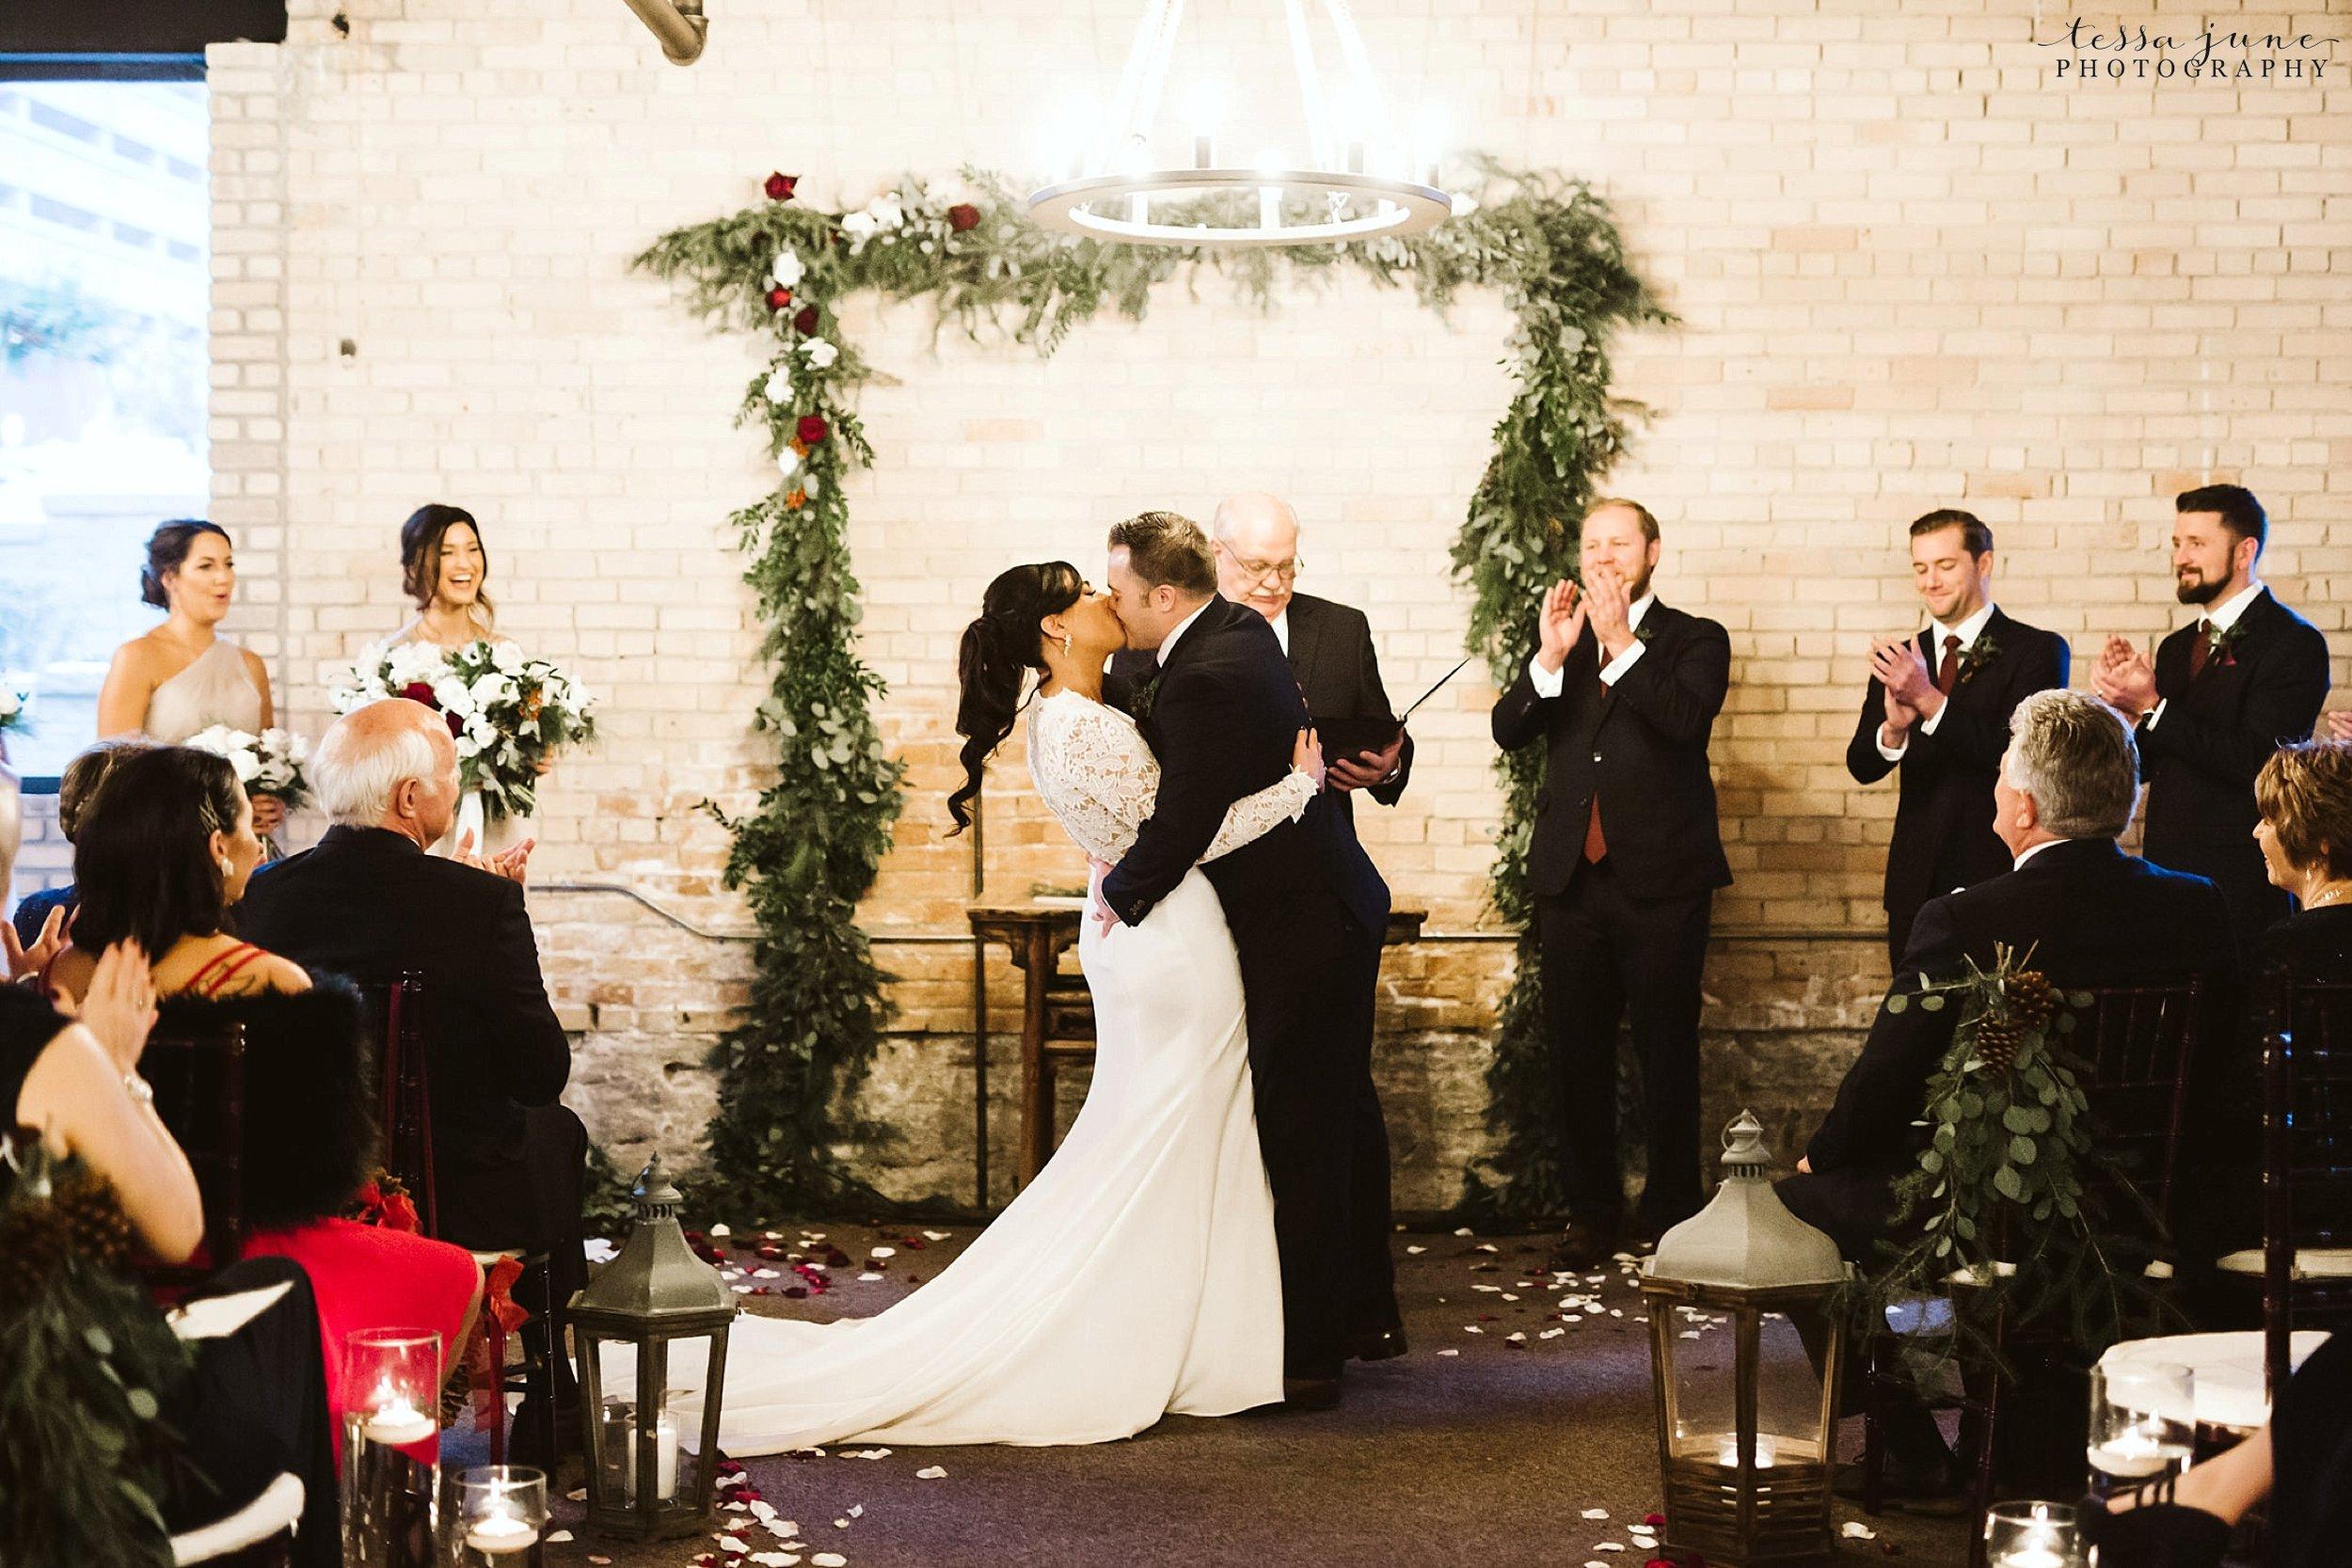 minneapolis-event-center-winter-romantic-snow-wedding-december-150.jpg